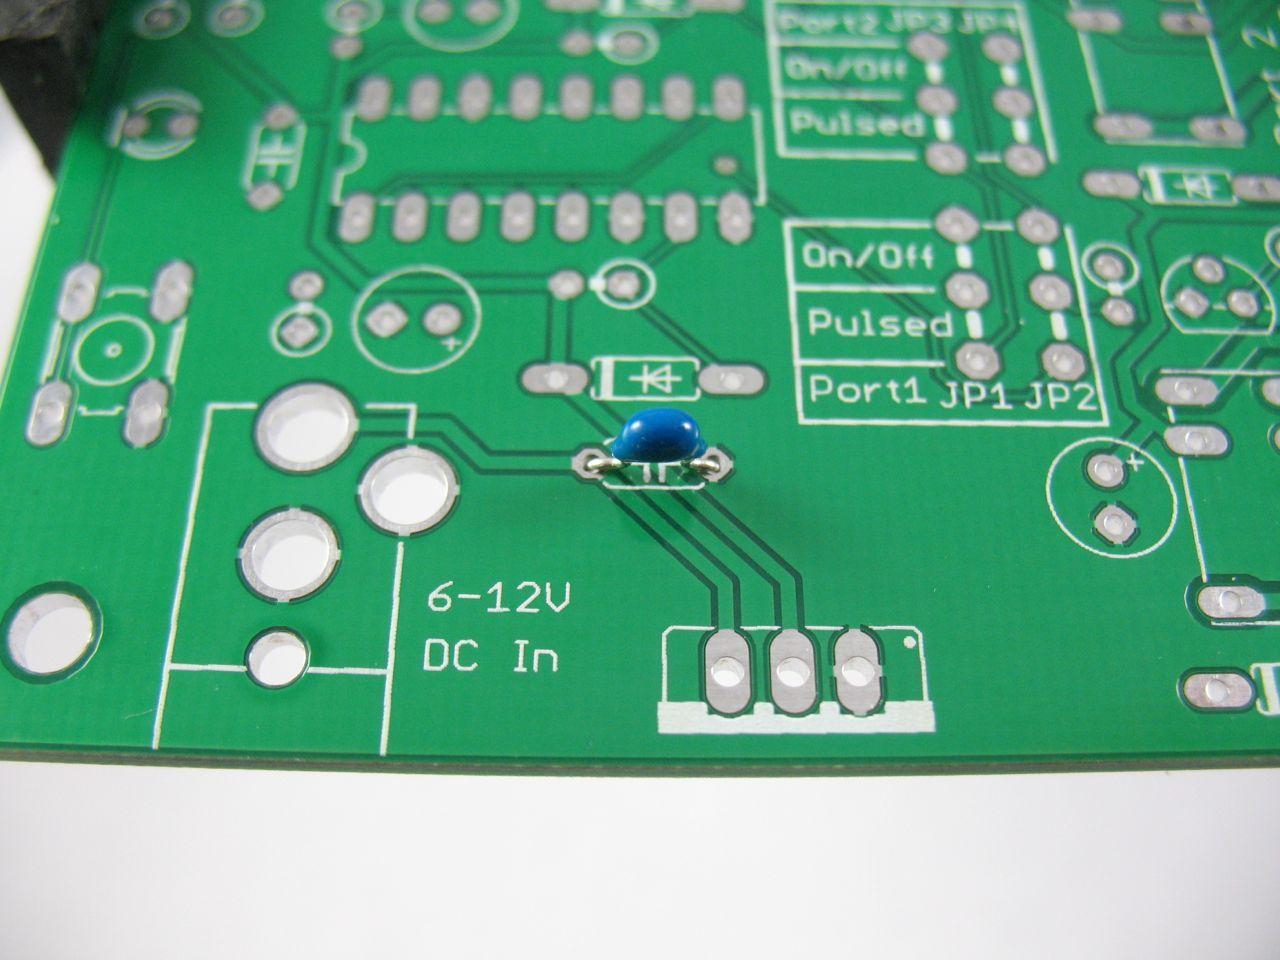 XBee Pulse I/O PCB AssemblyInstructions